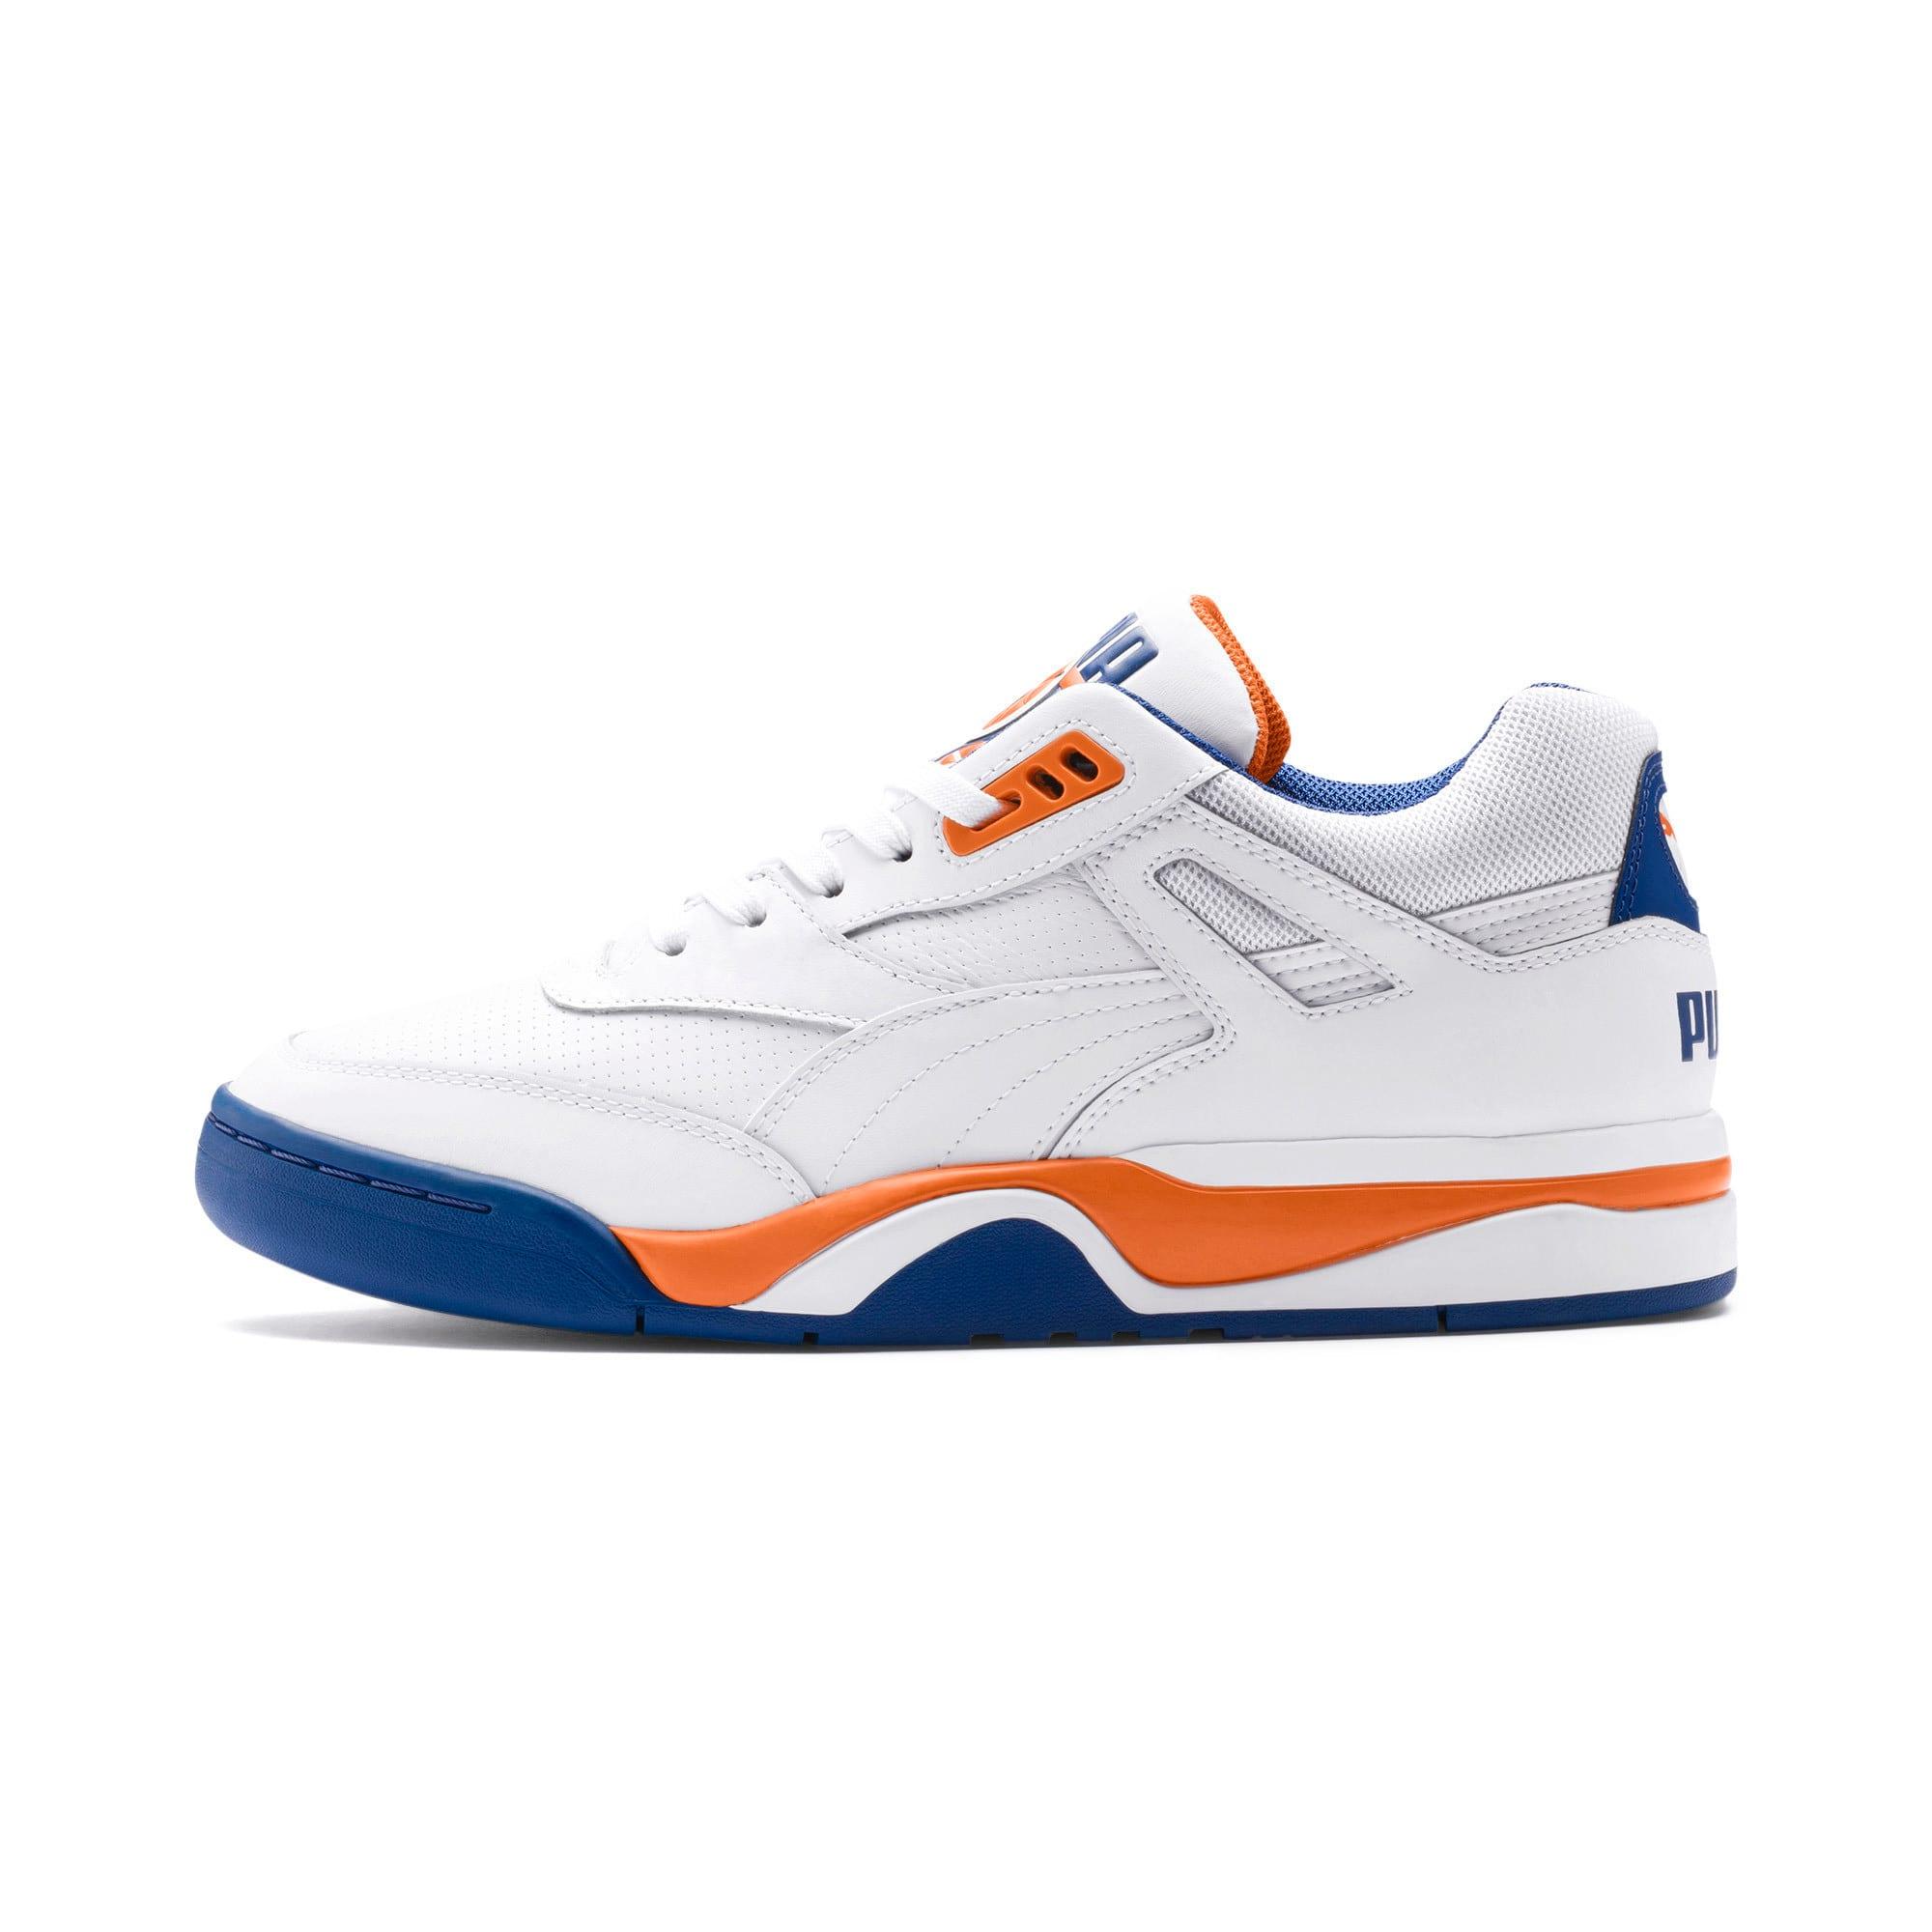 Imagen en miniatura 1 de Zapatillas de baloncesto de hombre Palace Guard, P White-Jaffa Orange-G Blue, mediana